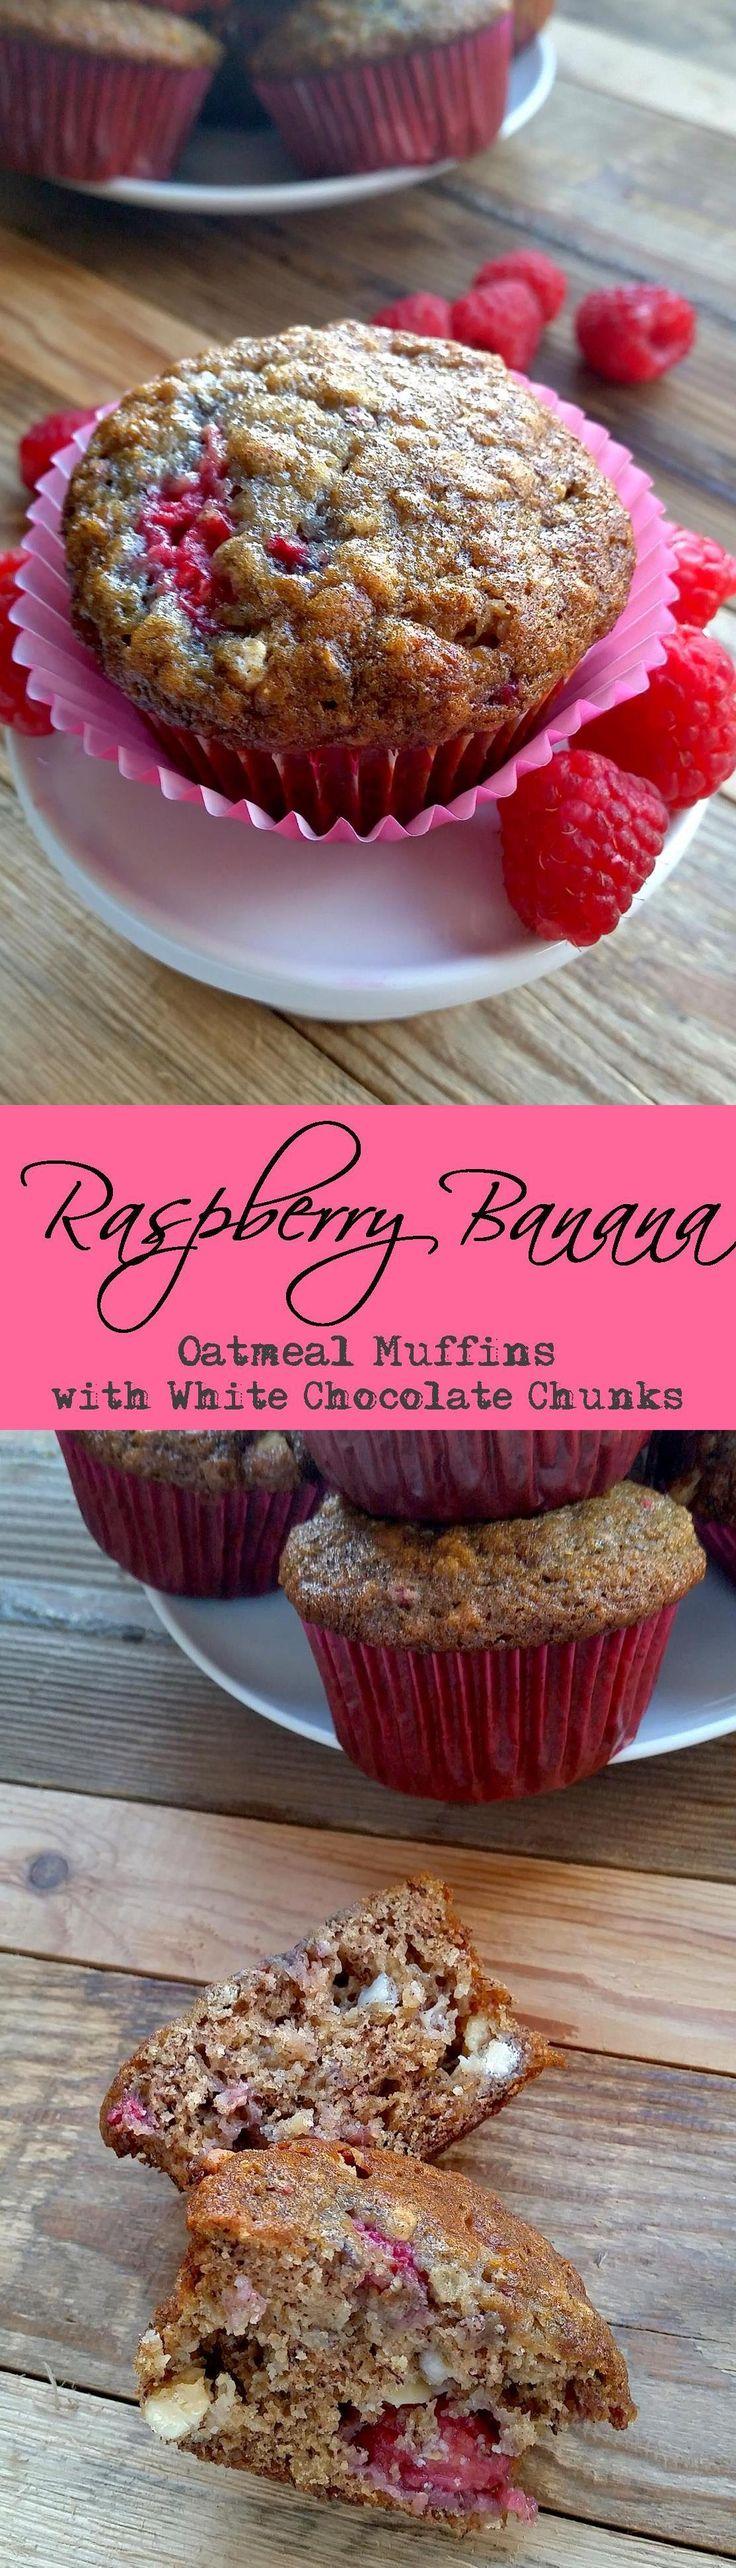 Raspberry Banana Oatmeal Muffins with White Chocolate Chunks